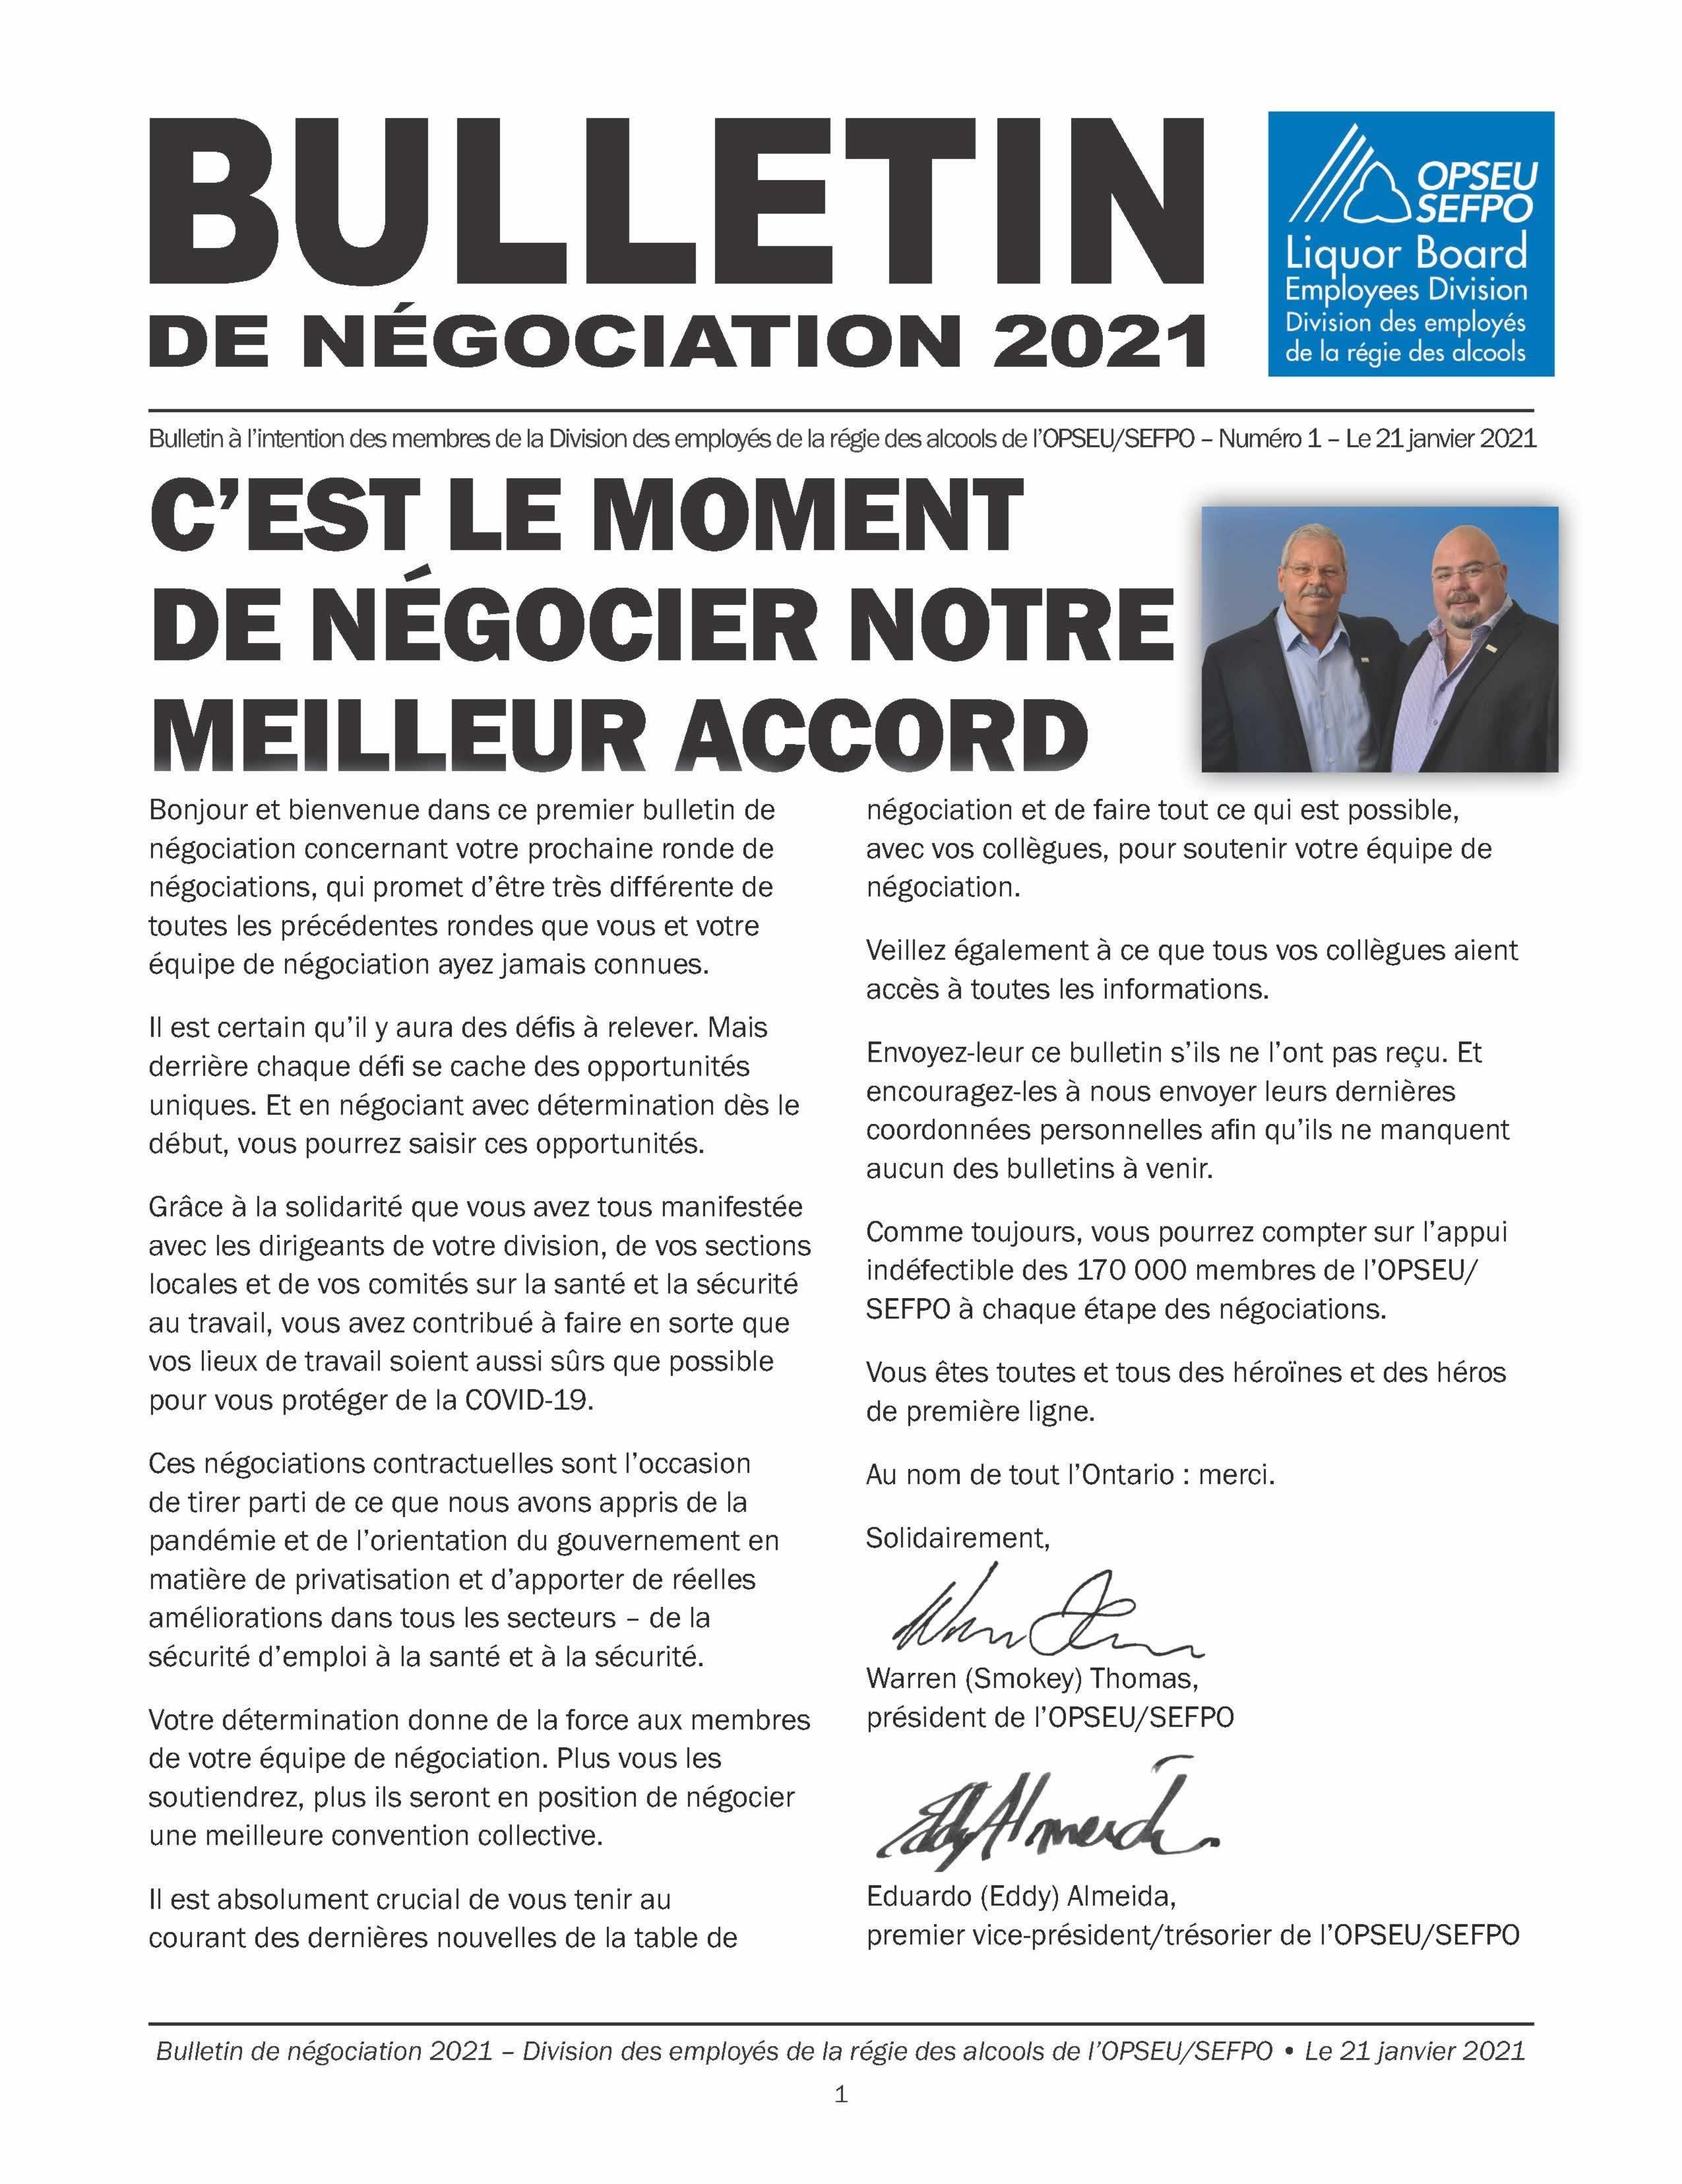 Bulletin de Negociation 2021. C'est le moment de negocier notre meilleur accord